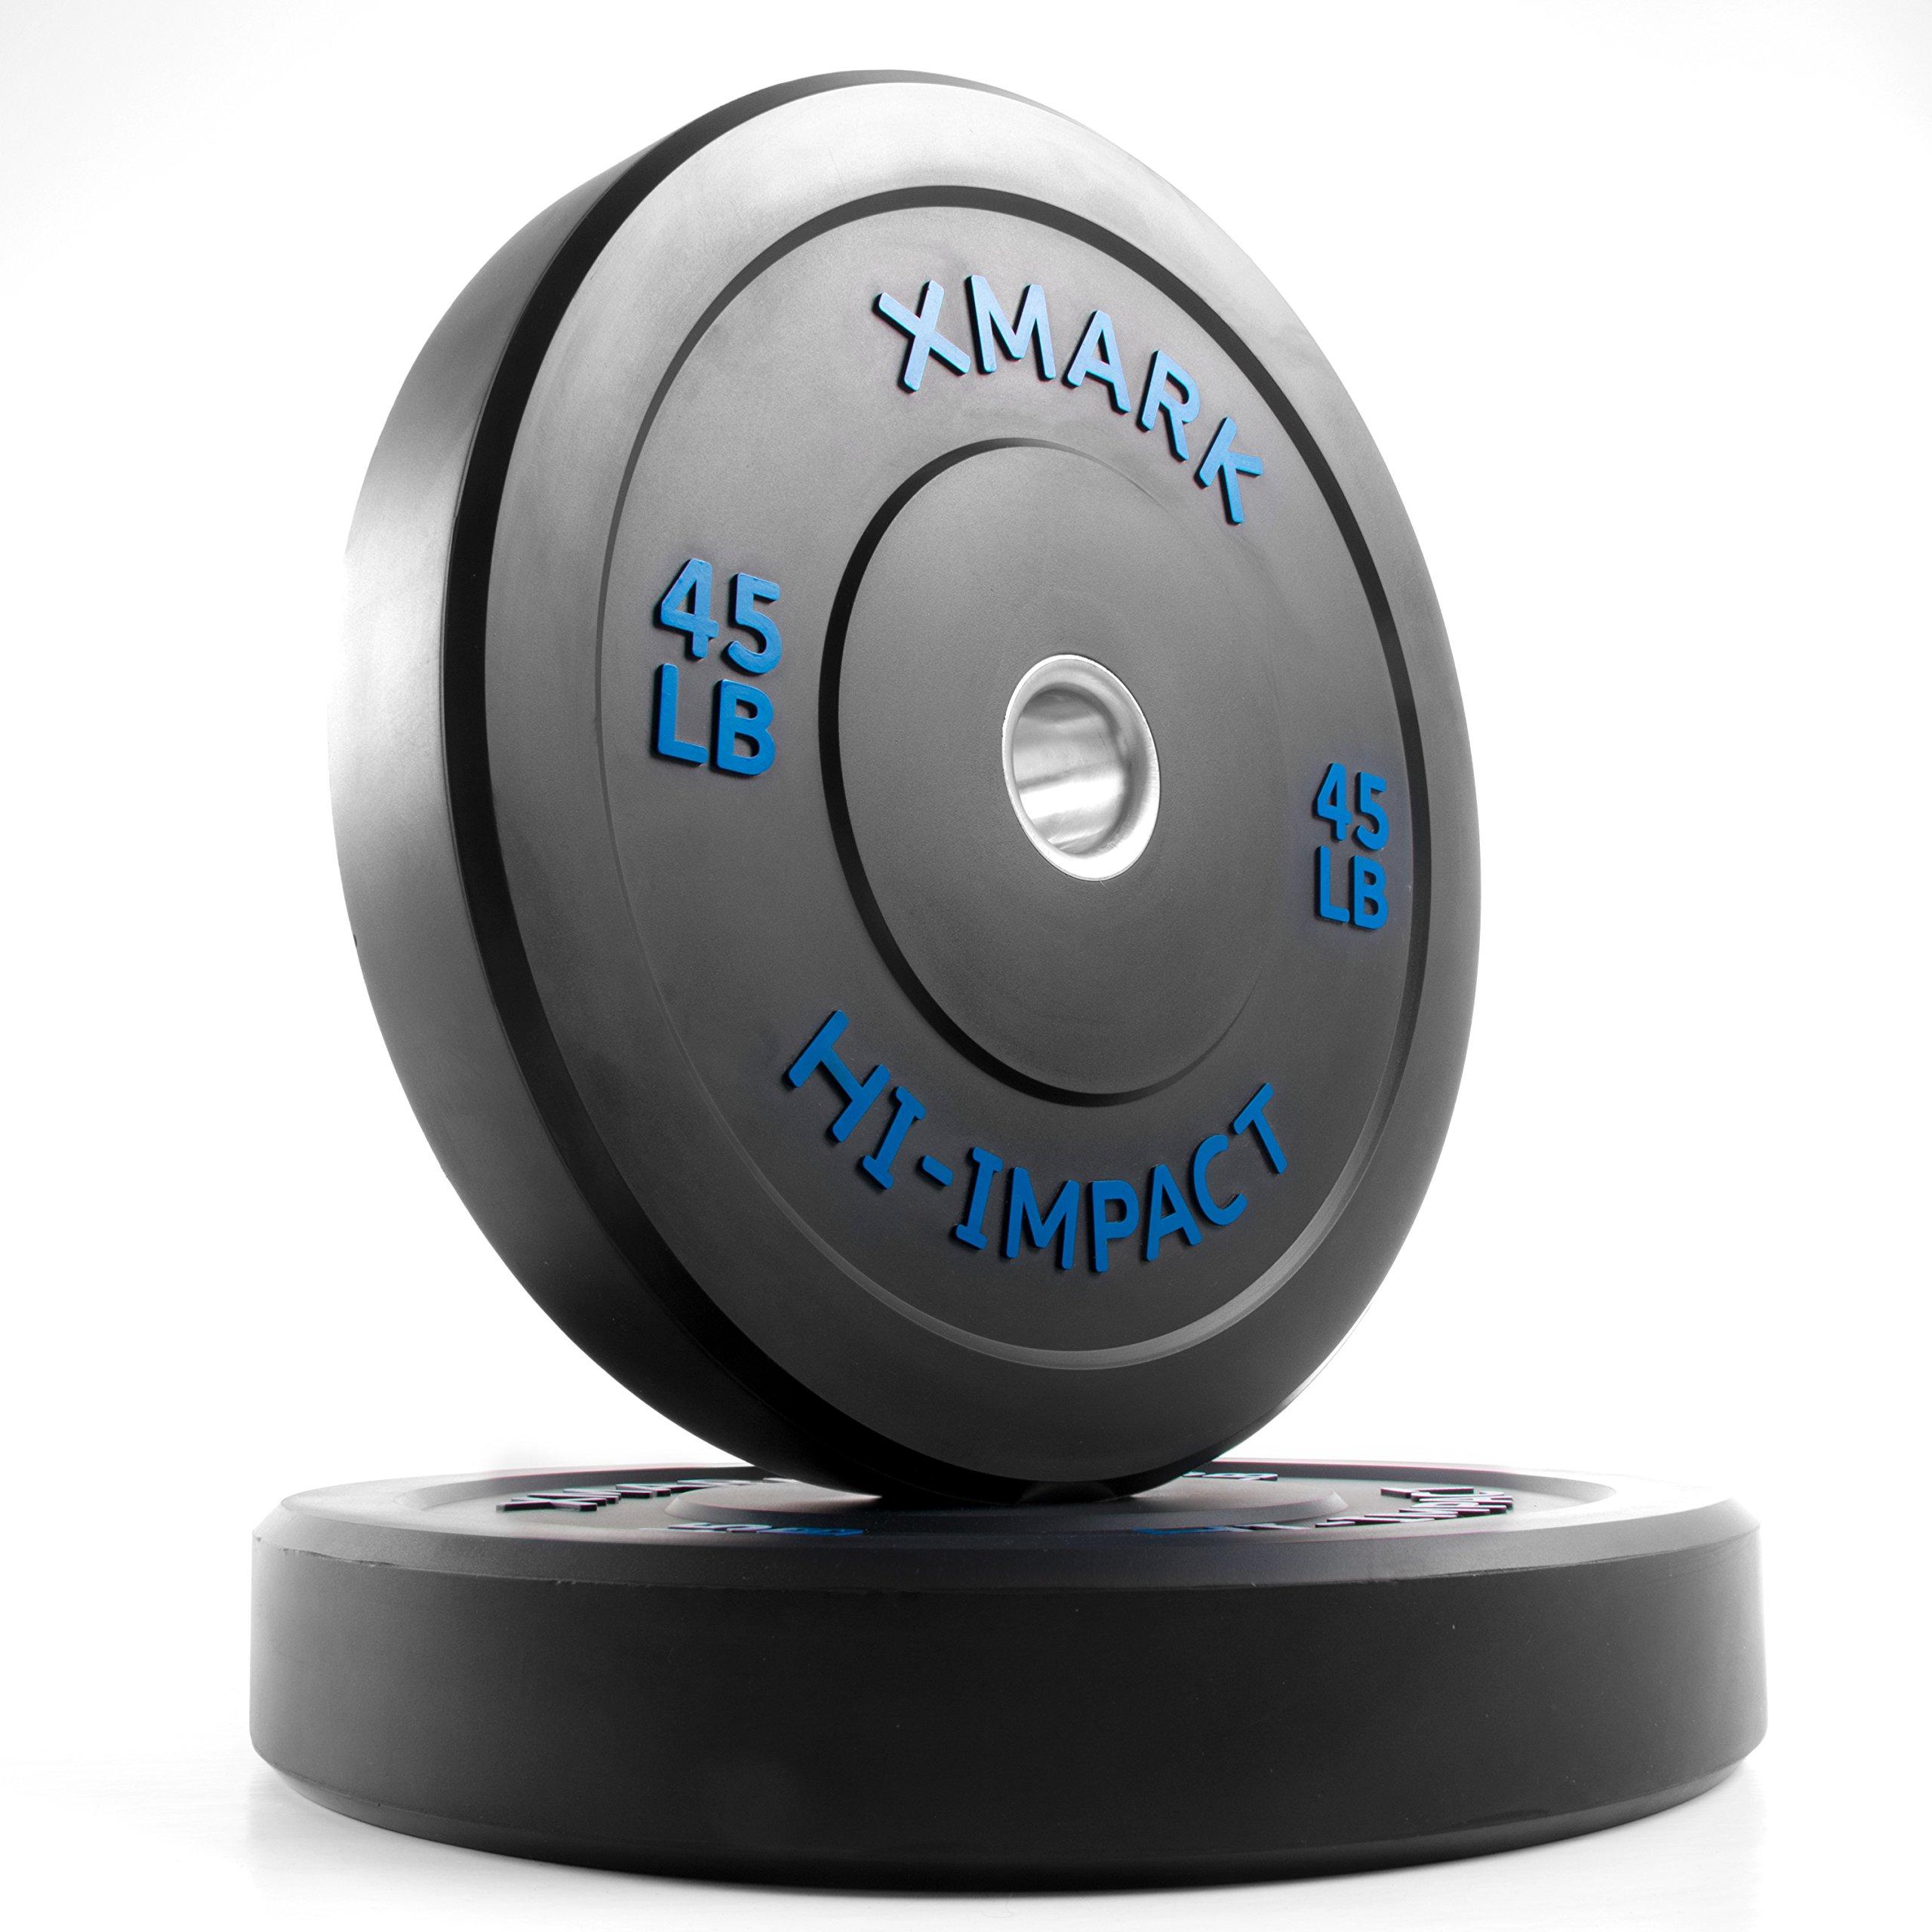 XMark 45 lb Pair Hi-Impact Bumper Plates, Three-Year Warranty, Hi-Impact Dead Bounce Commercial Olympic Bumper Weight Plates, XM-3393